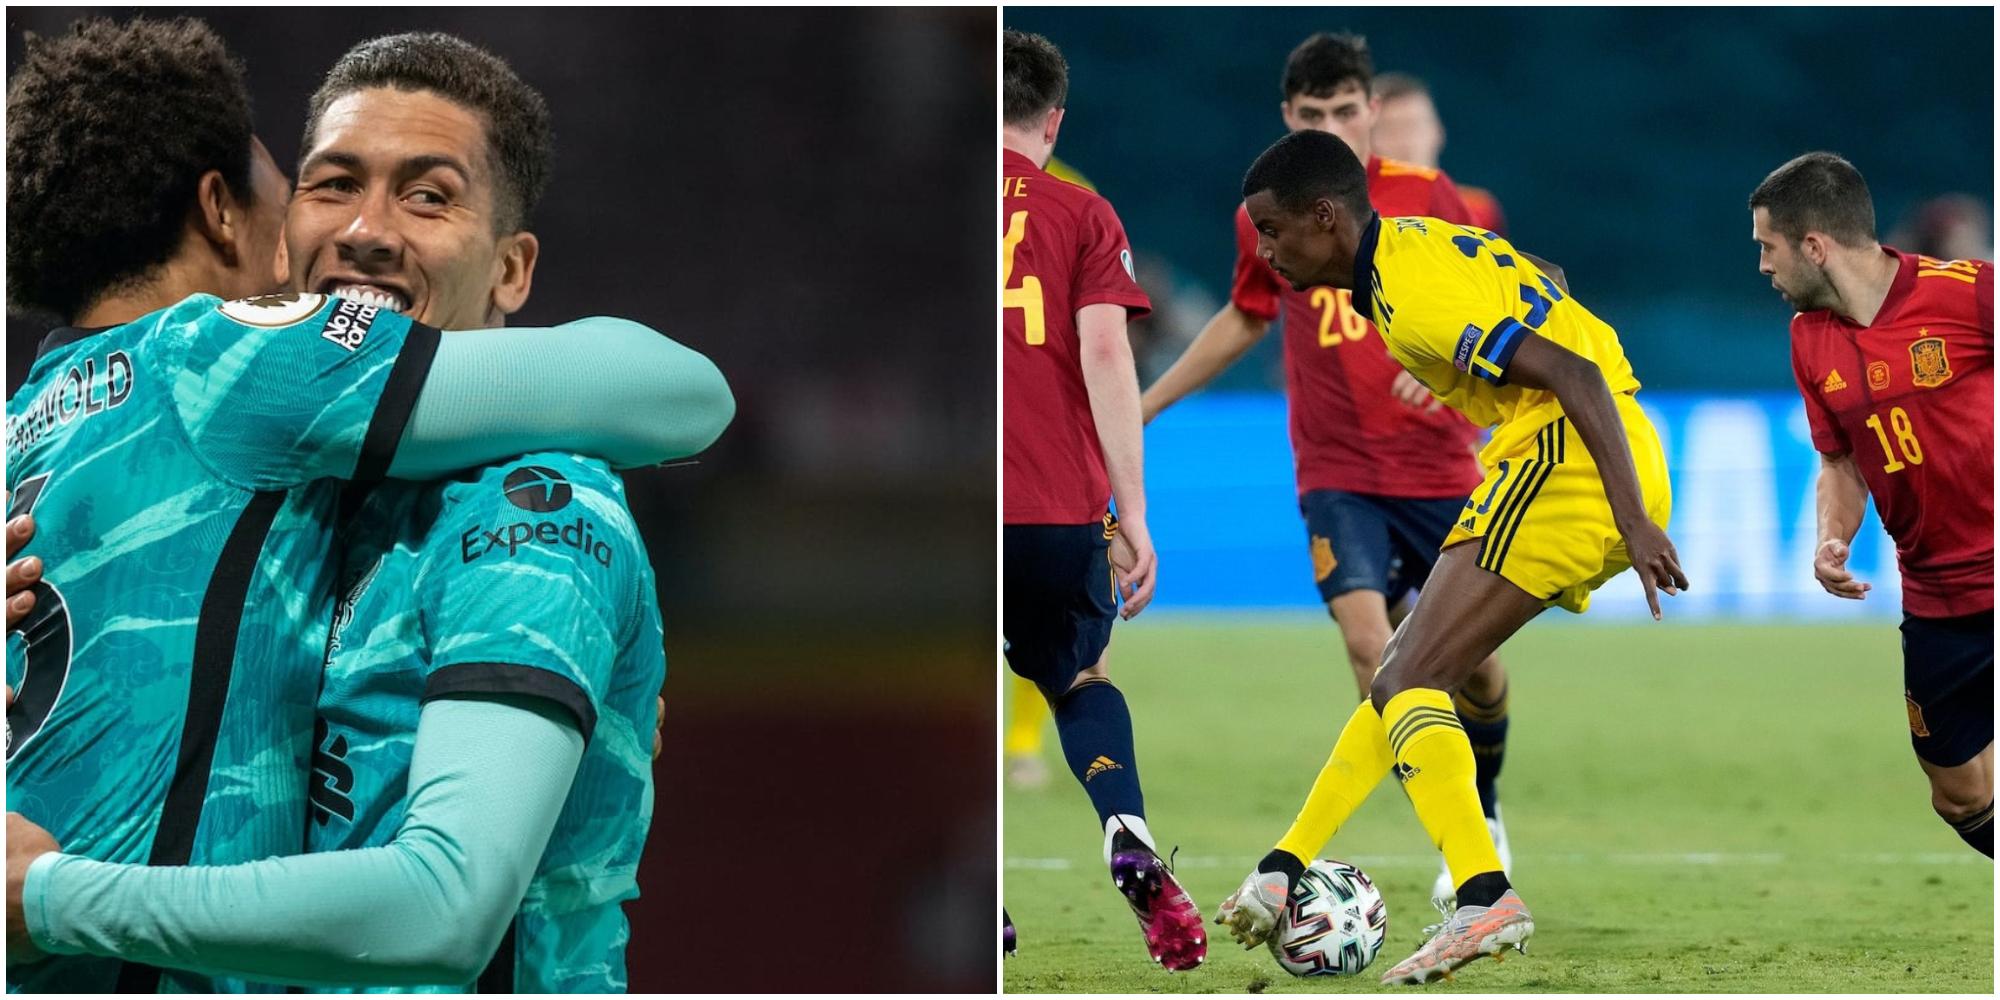 Liverpool tracking 17-goal La Liga star who impressed against Thiago's Spain – report